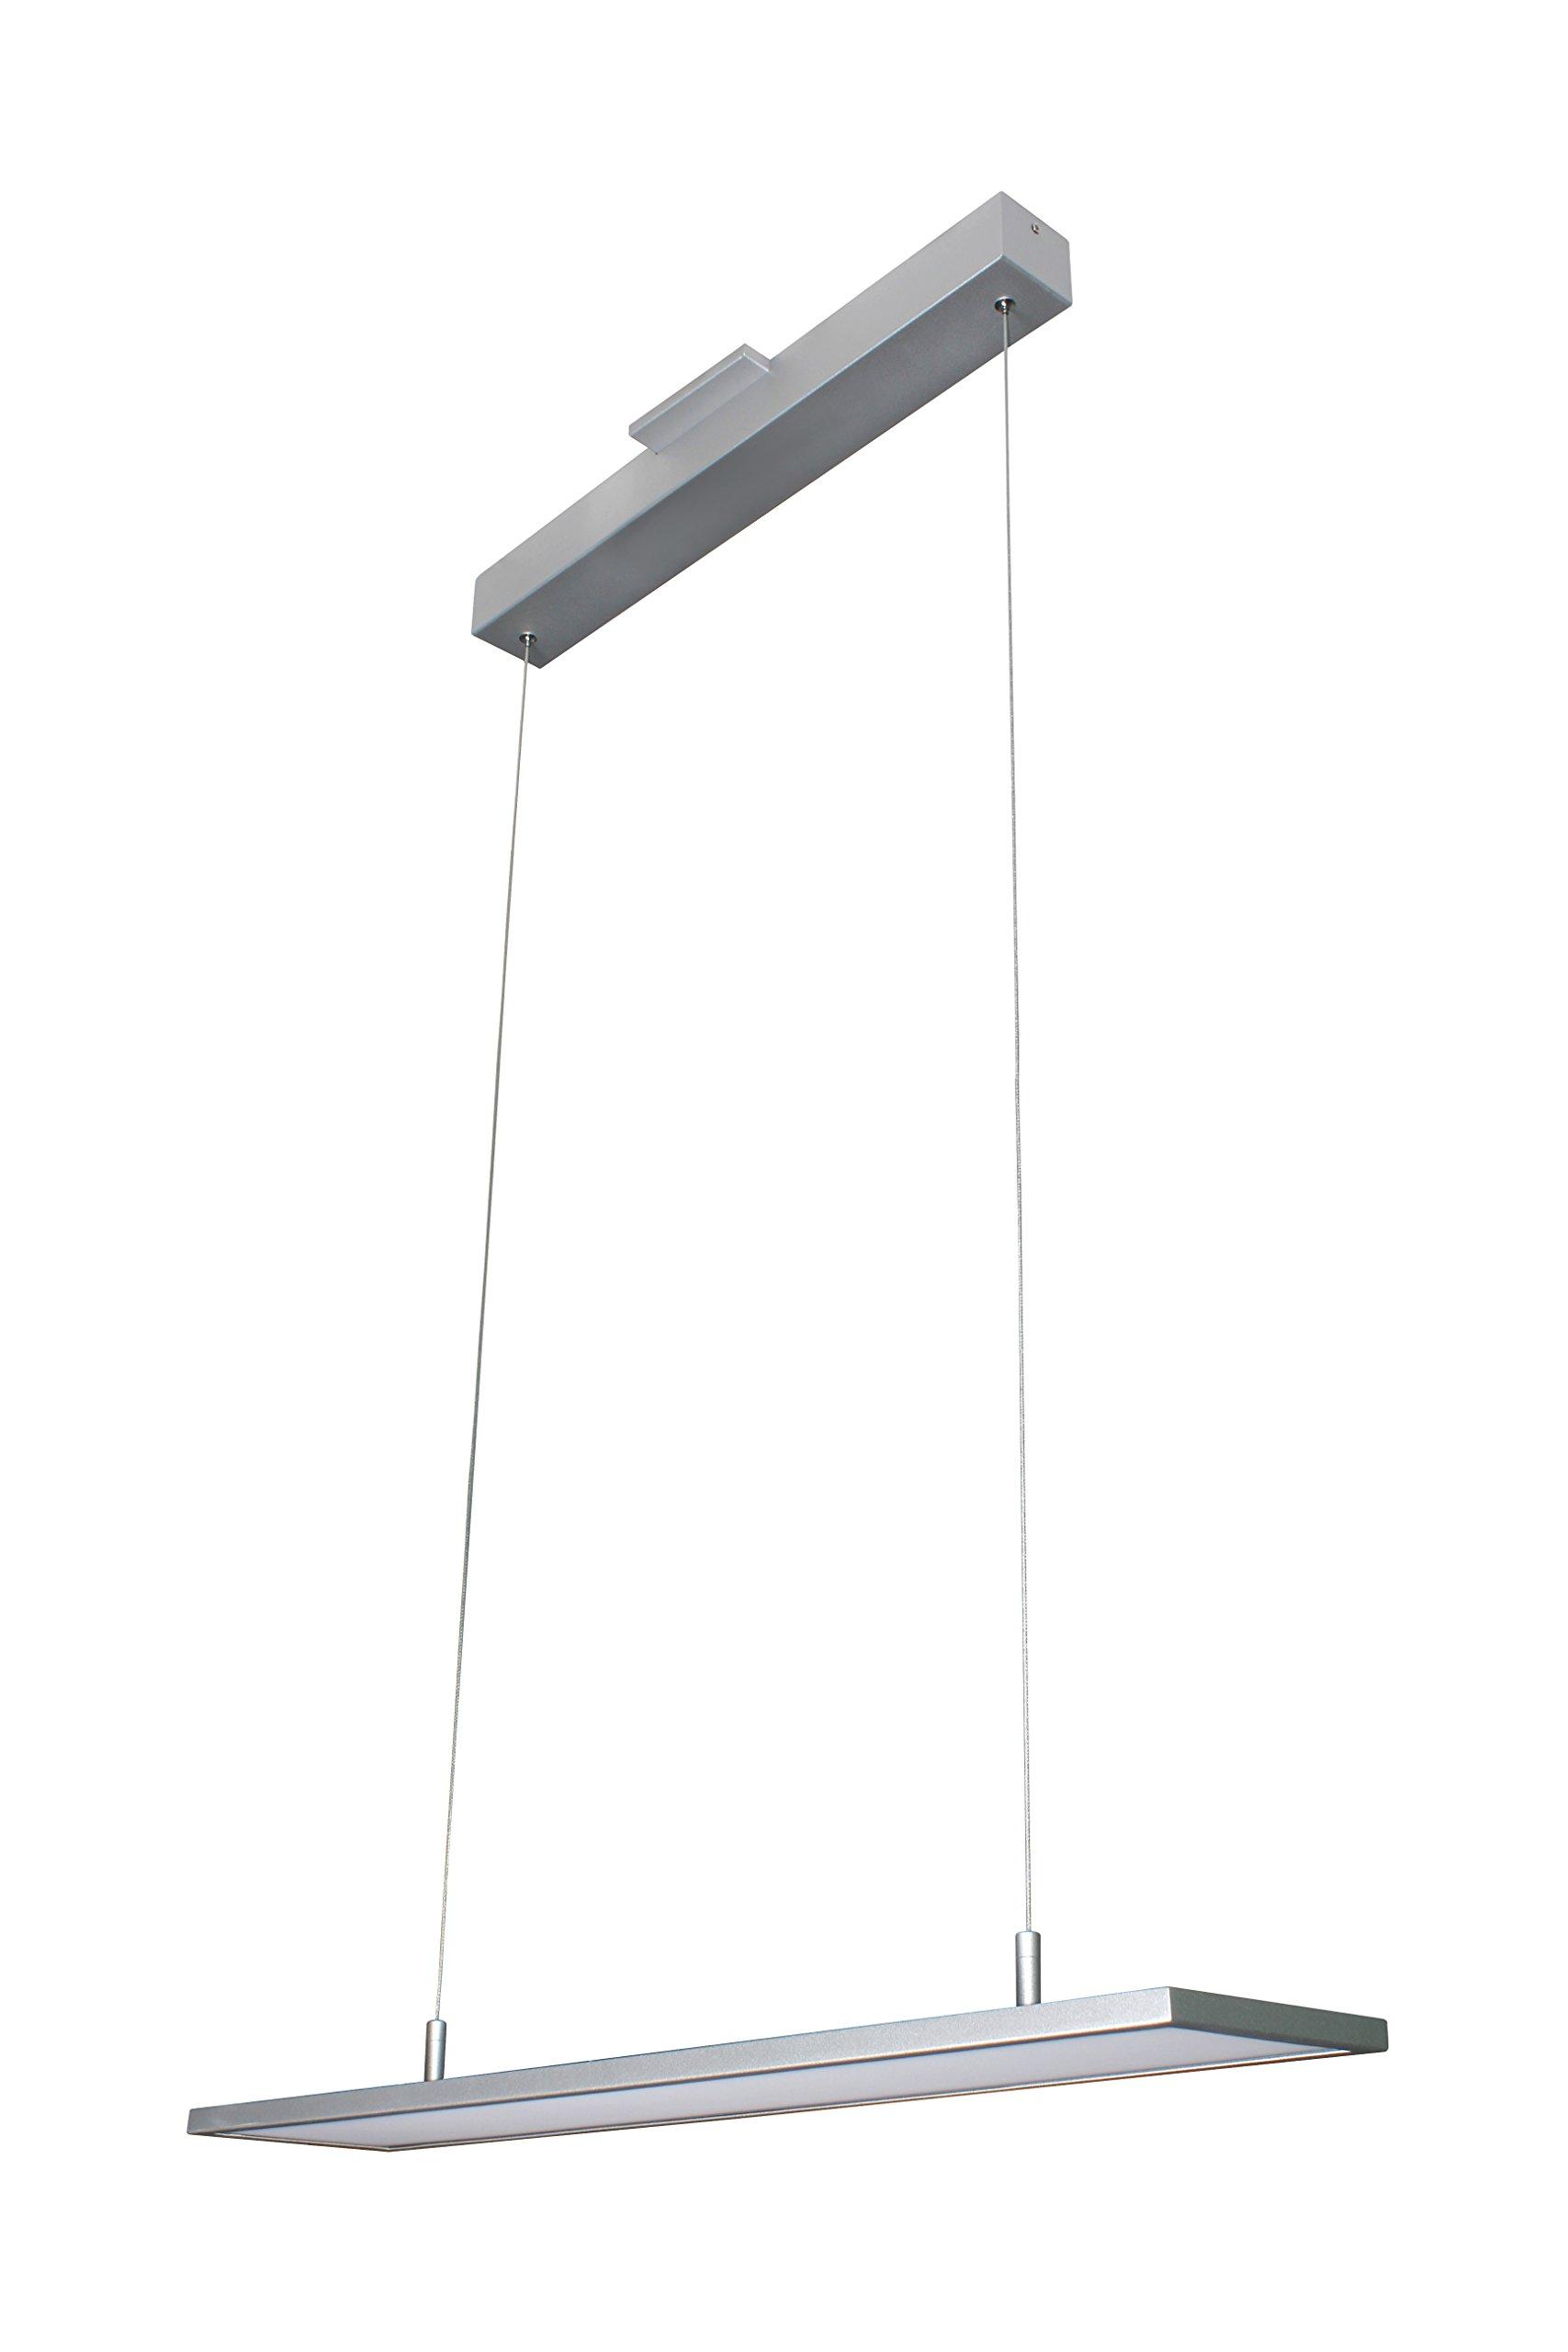 VONN VMC31610AL Modern Linear LED Chandelier Lighting with Adjustable Hanging Light, Silver